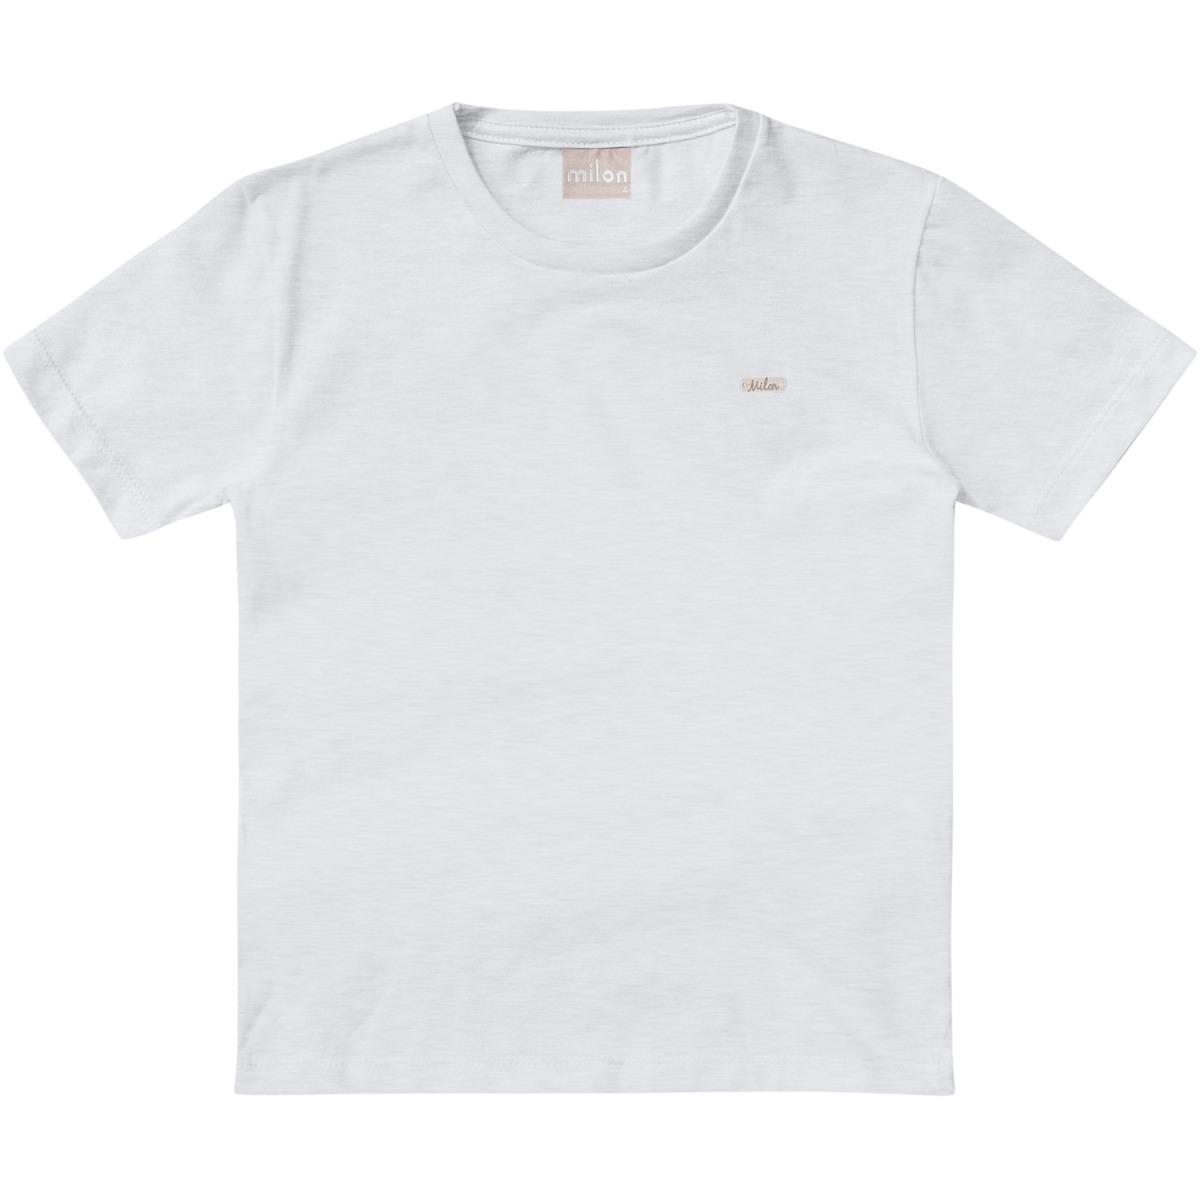 Camiseta Infantil Menino Milon - Mescla